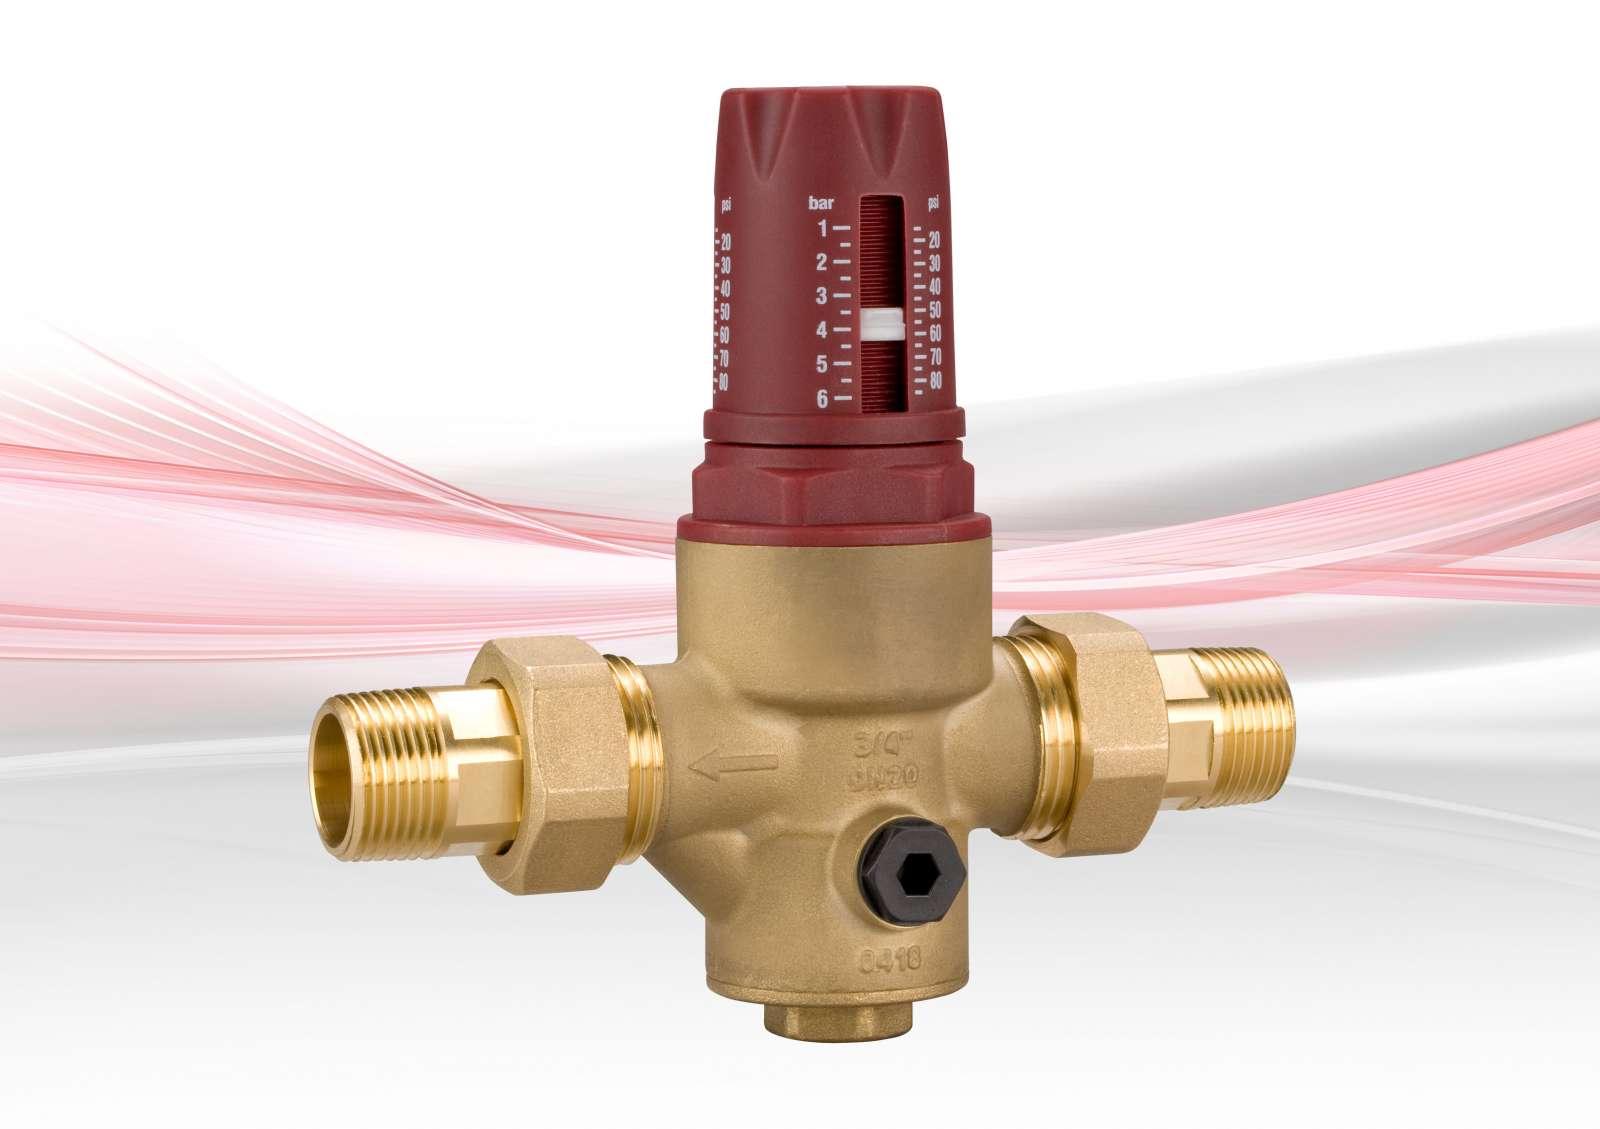 D1725 Pressure Reducing Valve Prv Pn25 Bronze Crane Fluid Systems Our Genius Is Valves Pipe Fittings